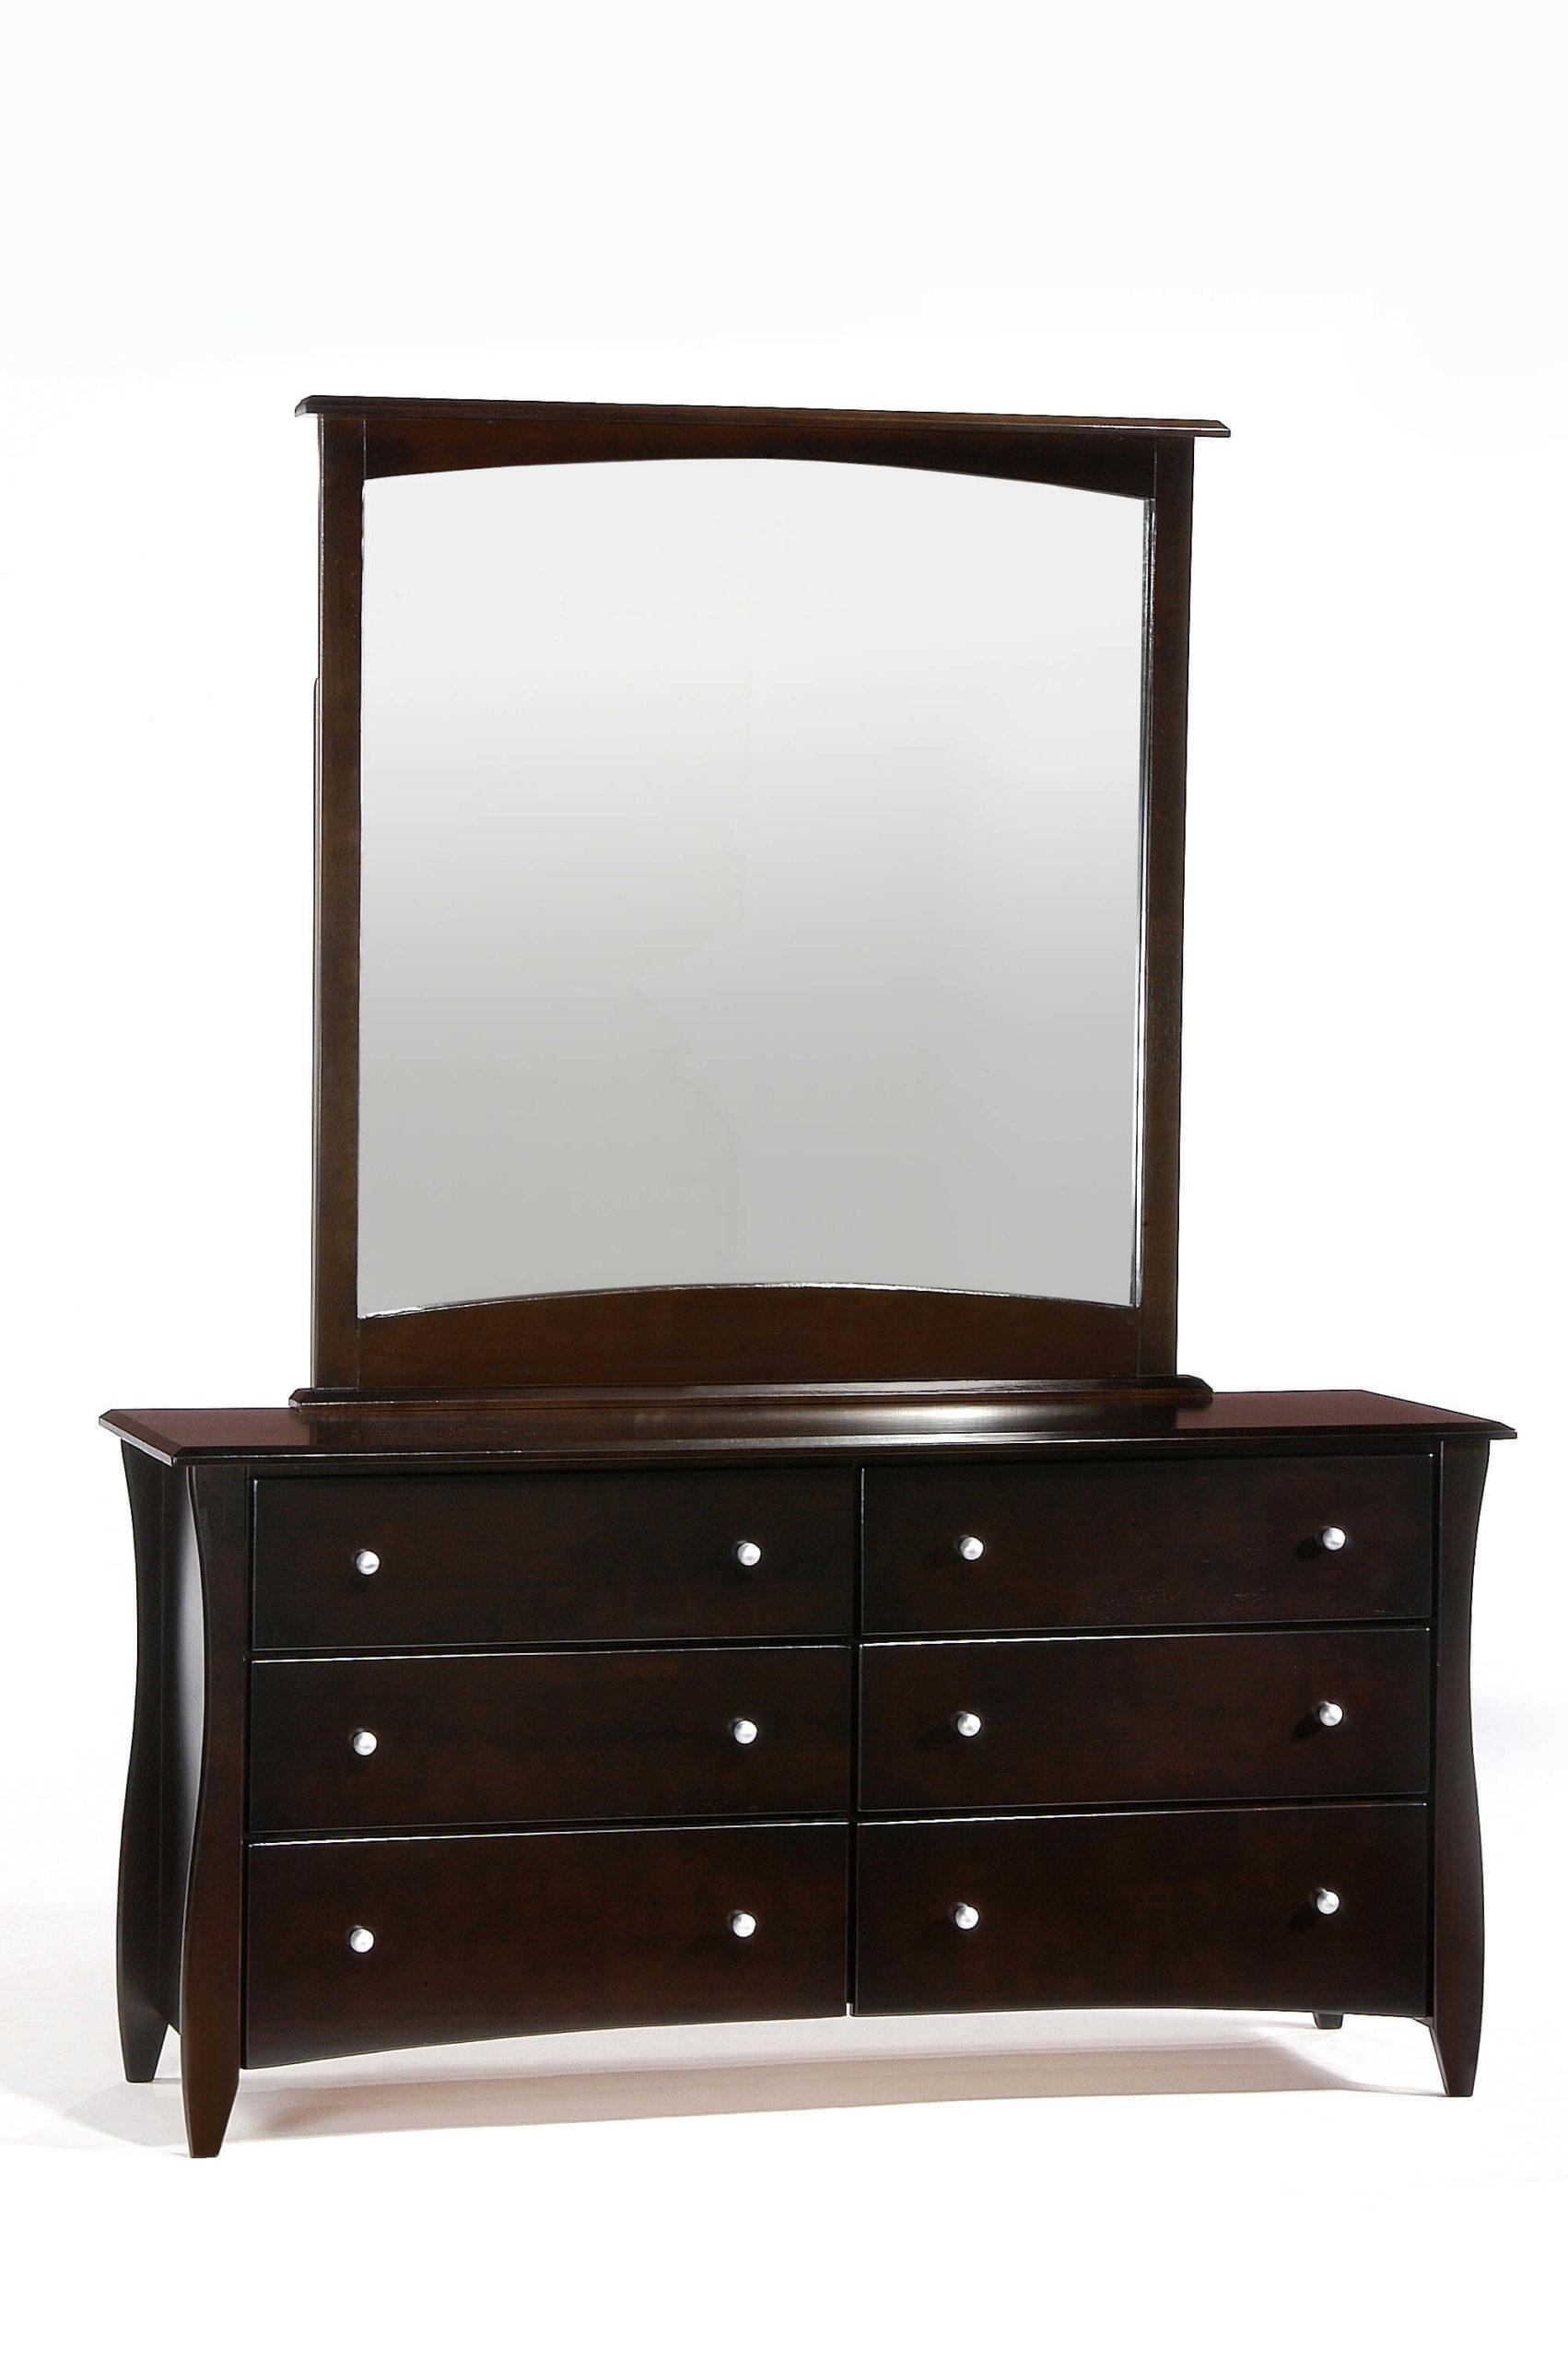 Clove 6-Drawer Dresser